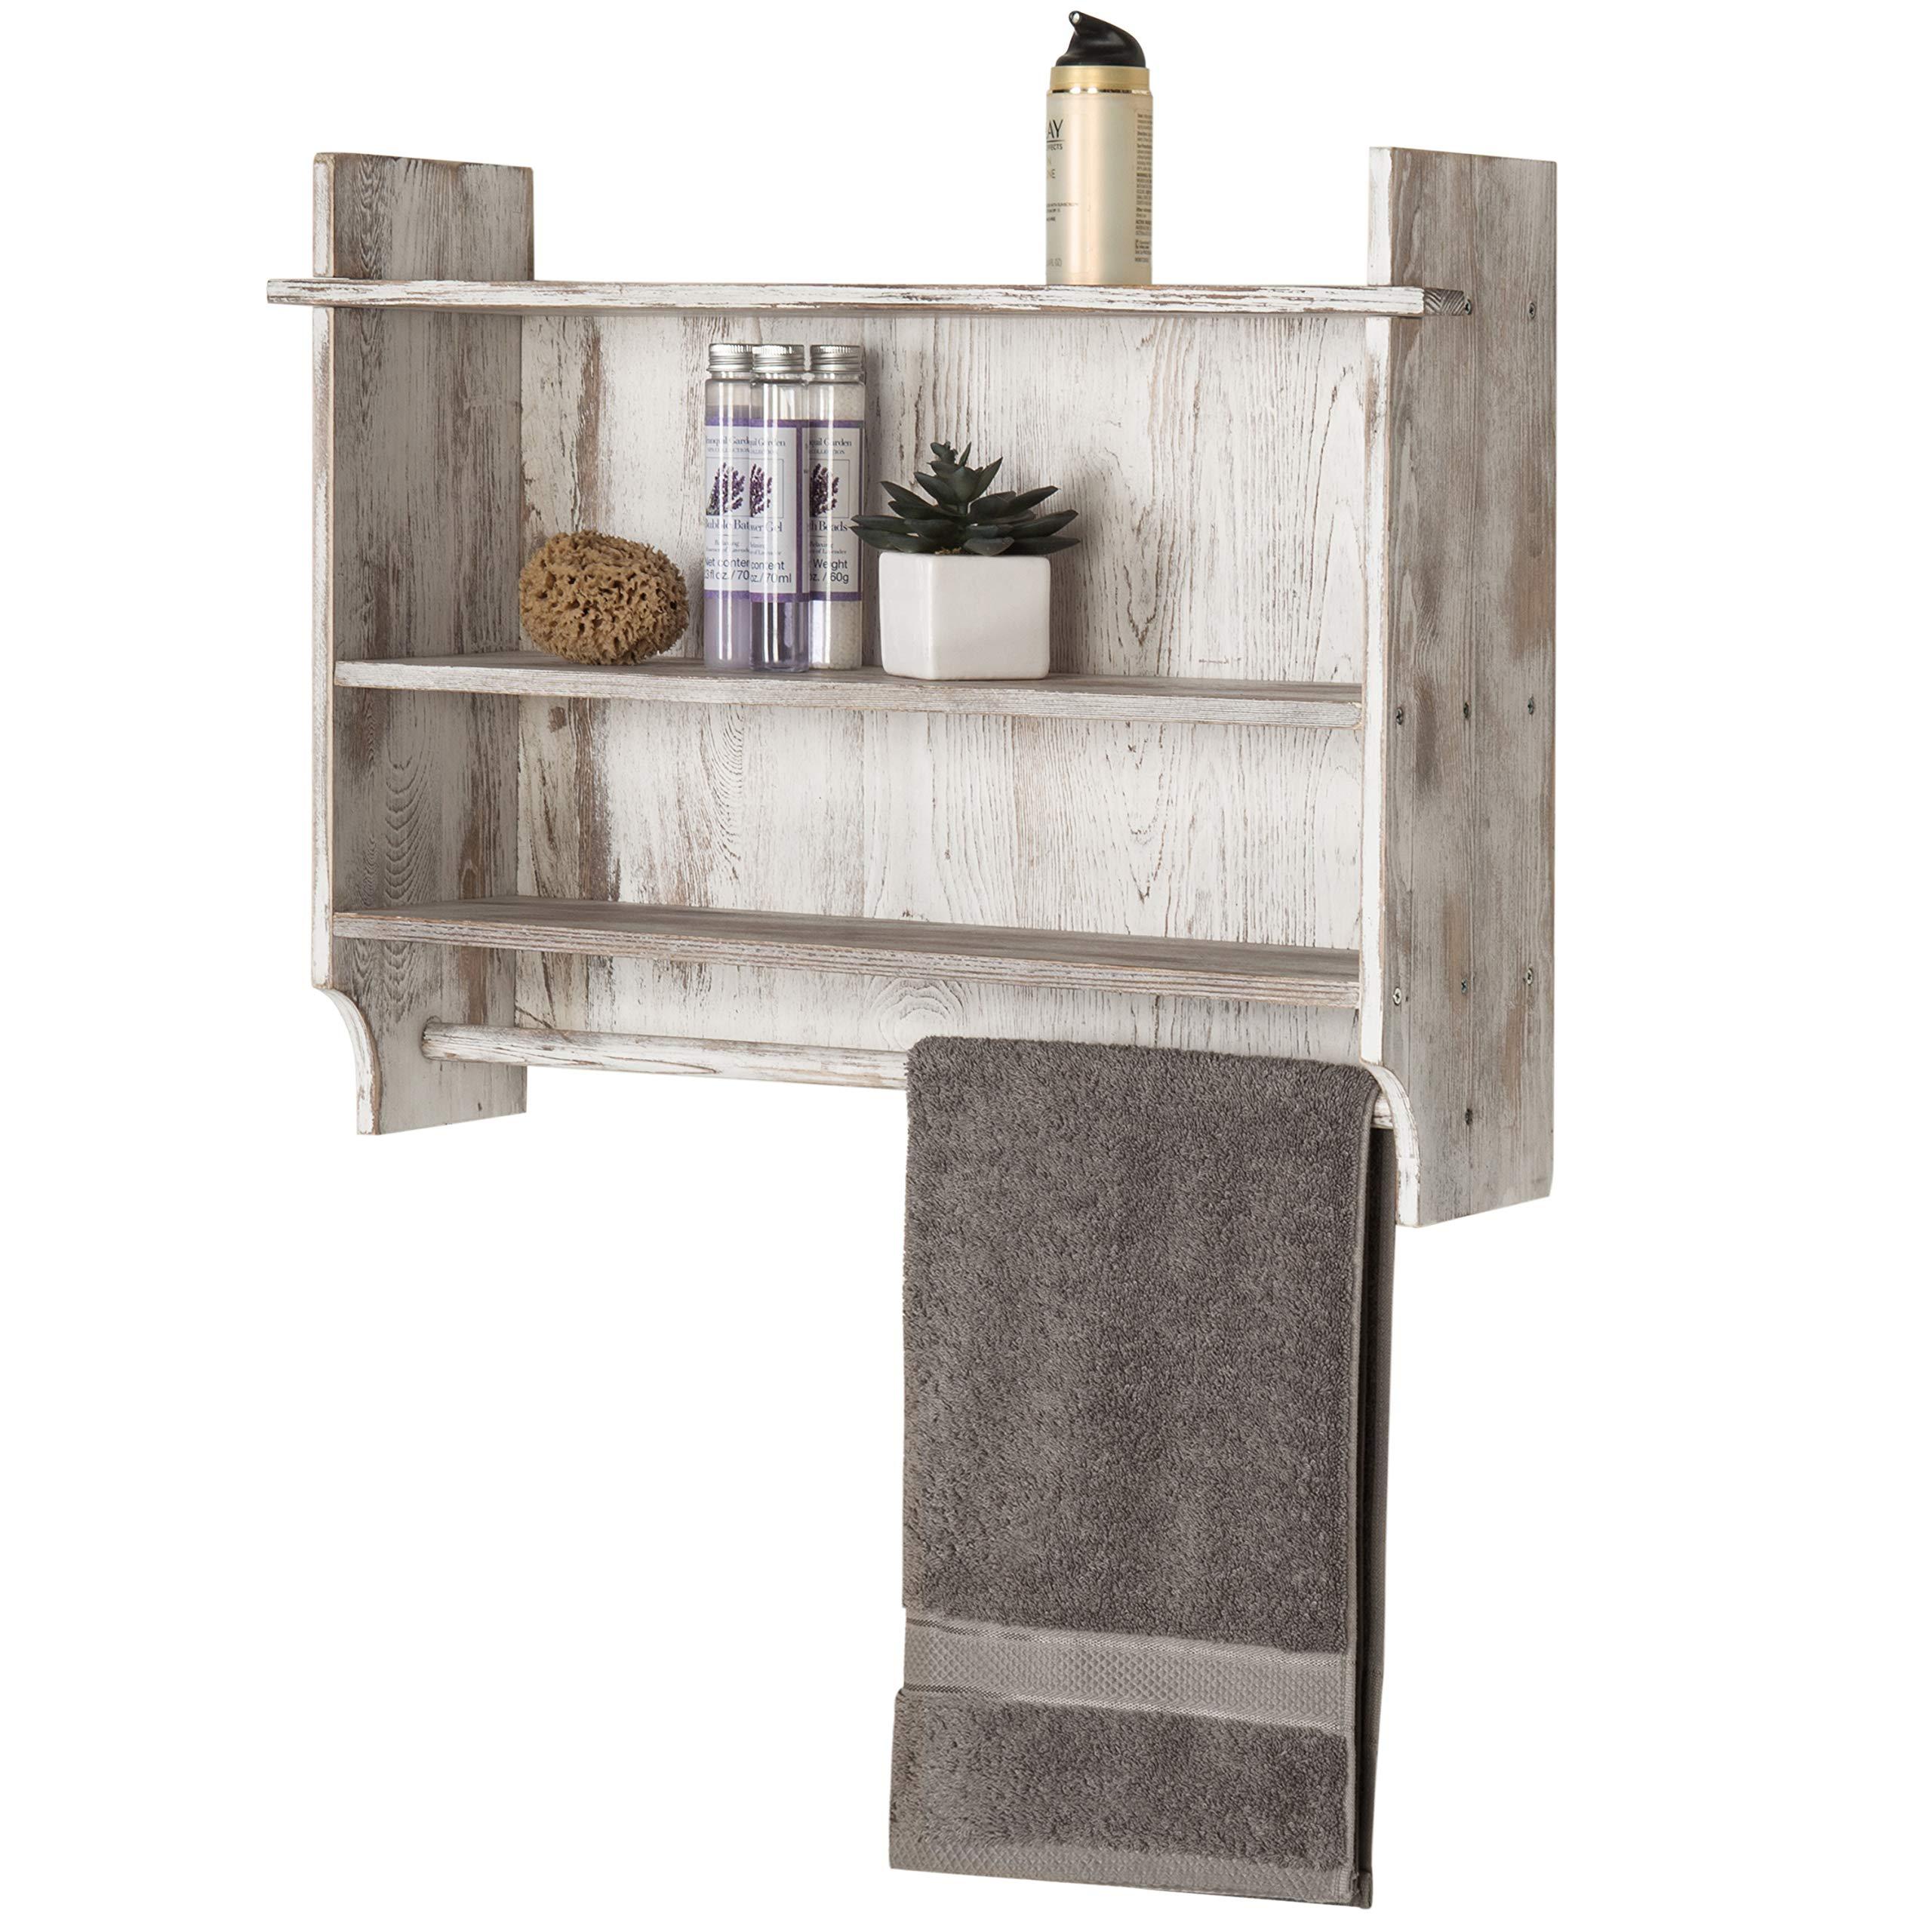 MyGift 3-Shelf Whitewashed Wall Mounted Bathroom Organizer Rack with Towel Bar